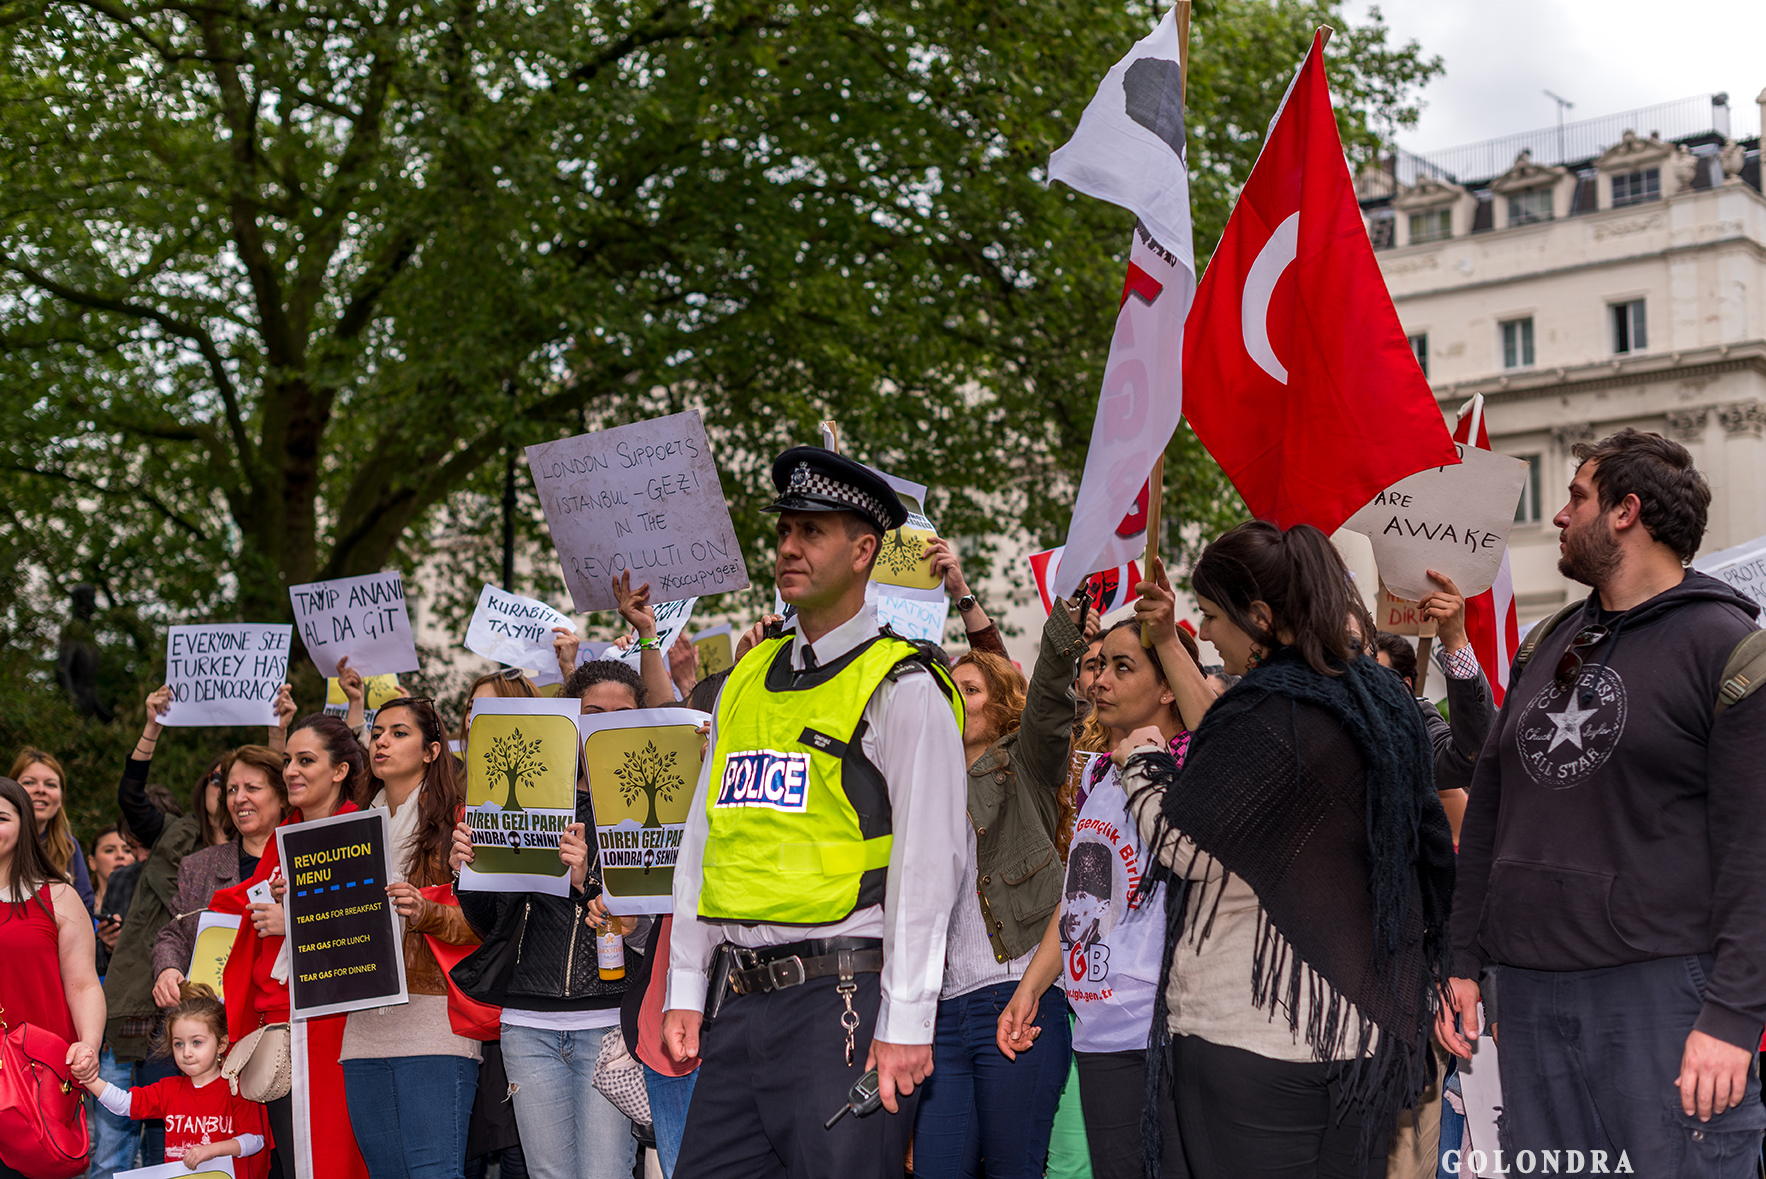 Protesting Turkish Government - Turk Hukumetini Protesto - Londra - London (38)